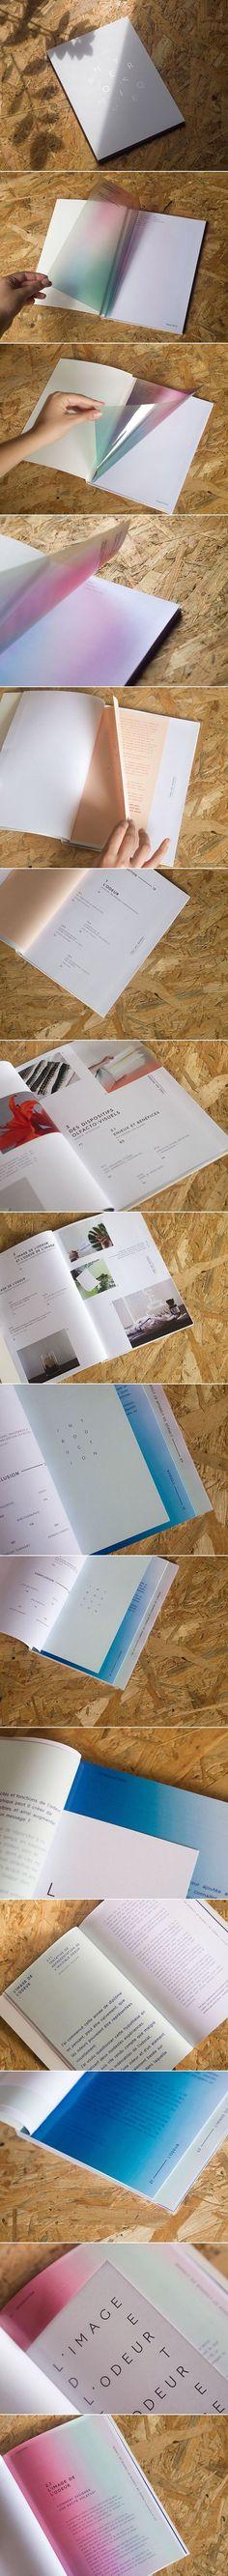 Design graphique hyperosmique on Behance. - a grouped images picture - Pin Them All Portfolio Design Layouts, Layout Design, Book Portfolio, Graphisches Design, Buch Design, Print Layout, Cover Design, Design Color, Logo Design